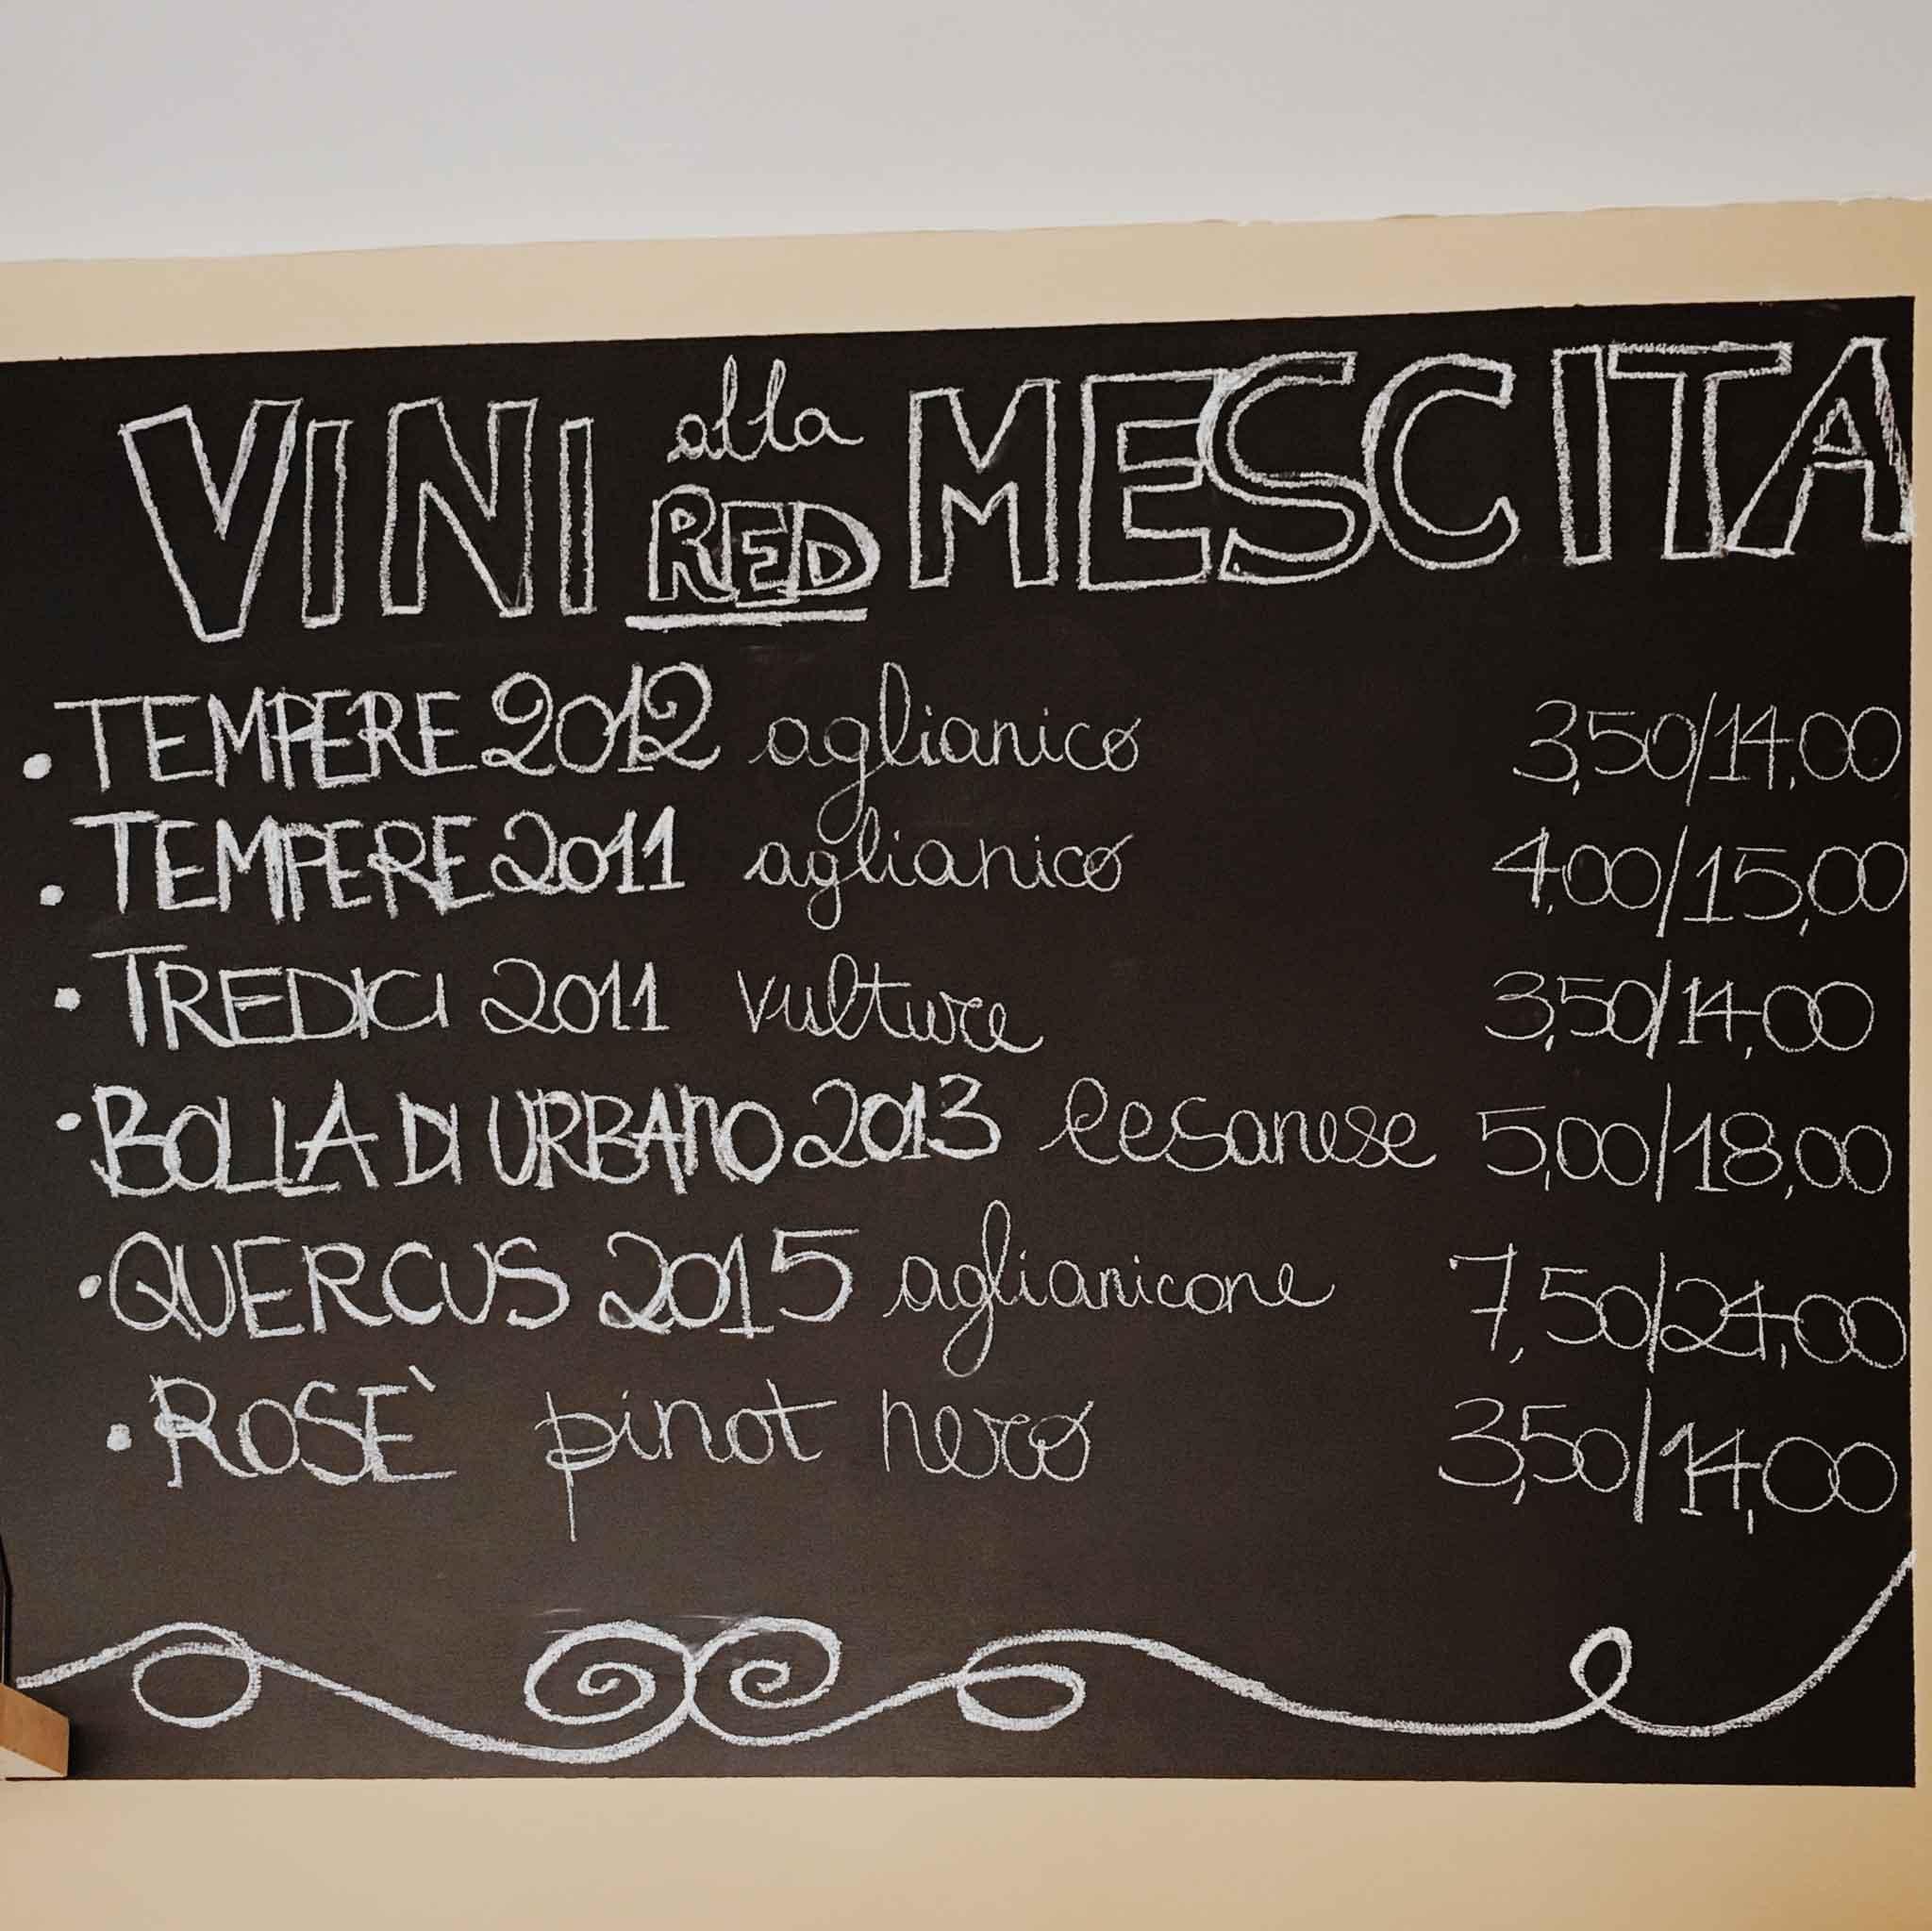 vinoteca-tempere-roma-prezzi-vini